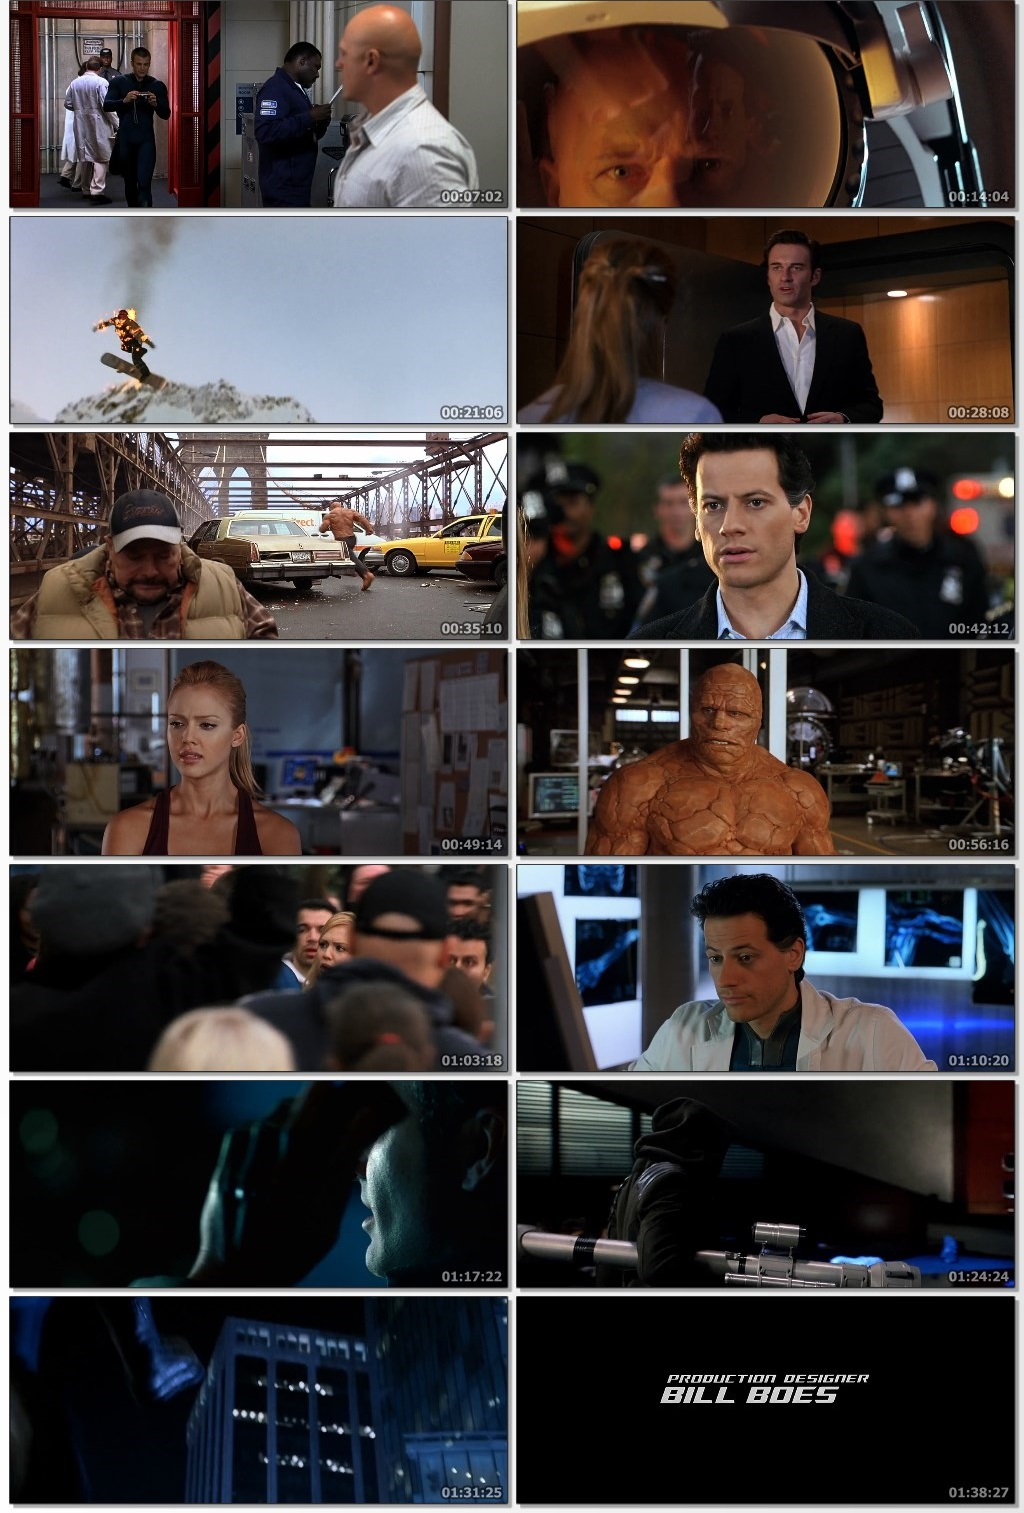 Fantastic-Four-2005-www-1kmovies-cyou-Hindi-Dual-Audio-720p-Blu-Ray-ESubs-1-GB-mkv-thumbs